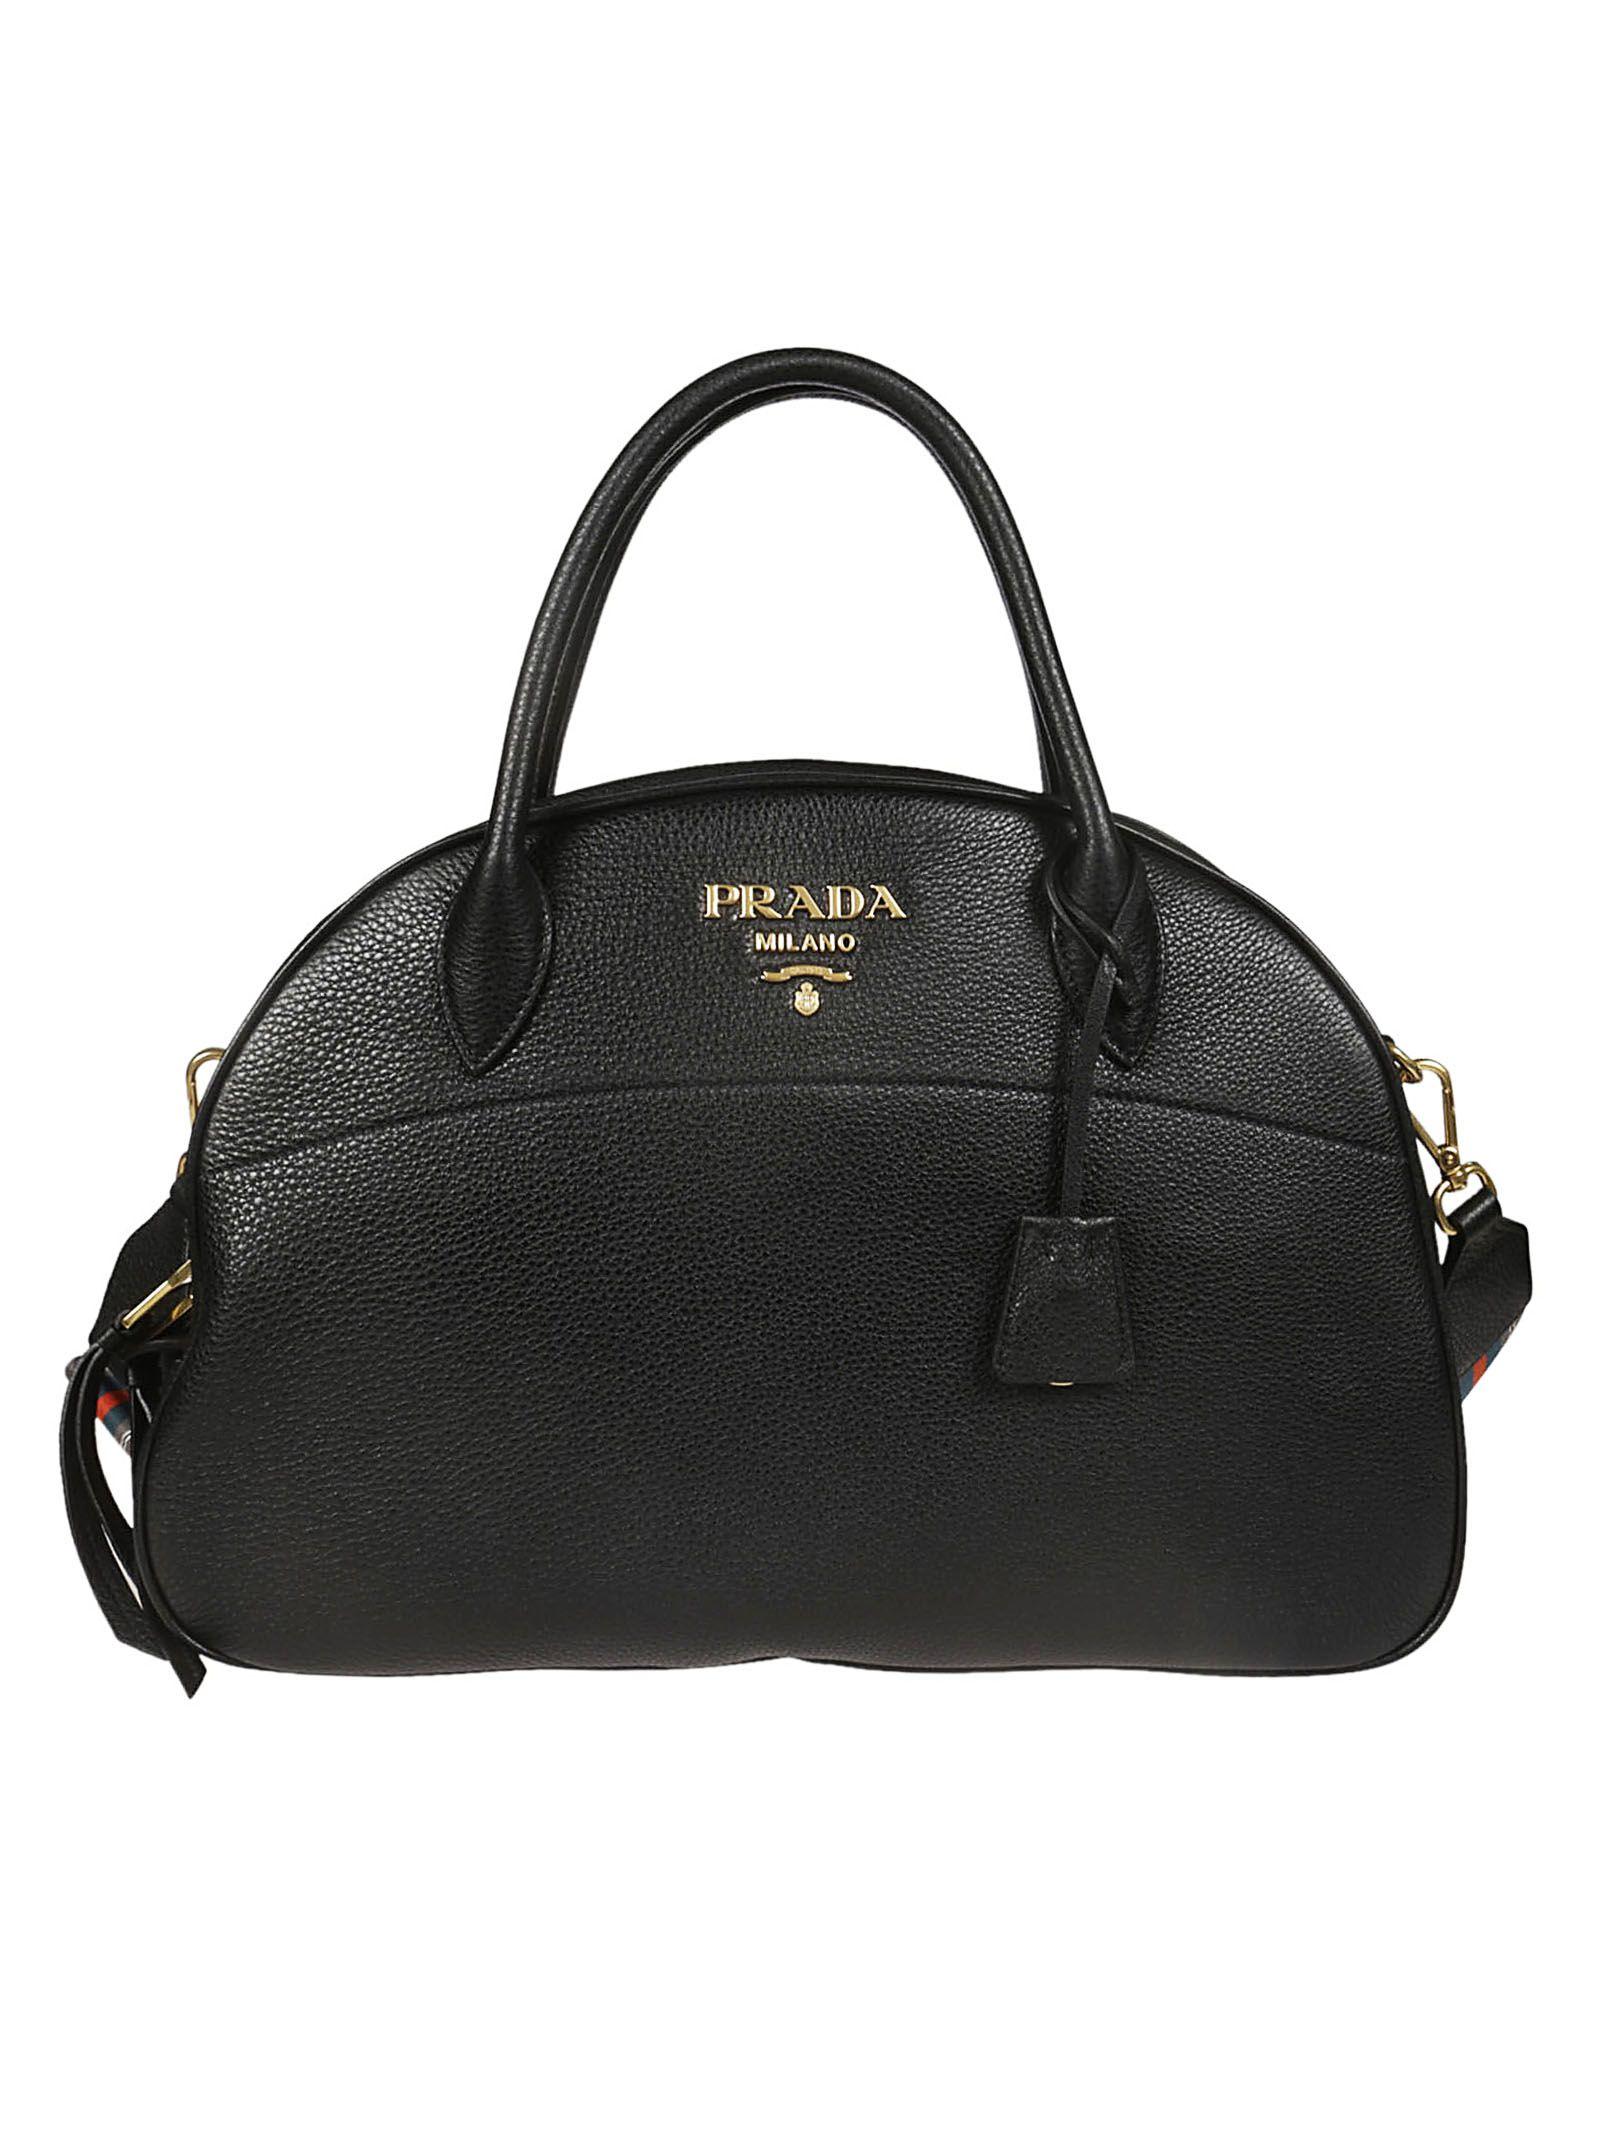 7973dff66a11 Prada Prada Classic Logo Tote - Black - 10831145